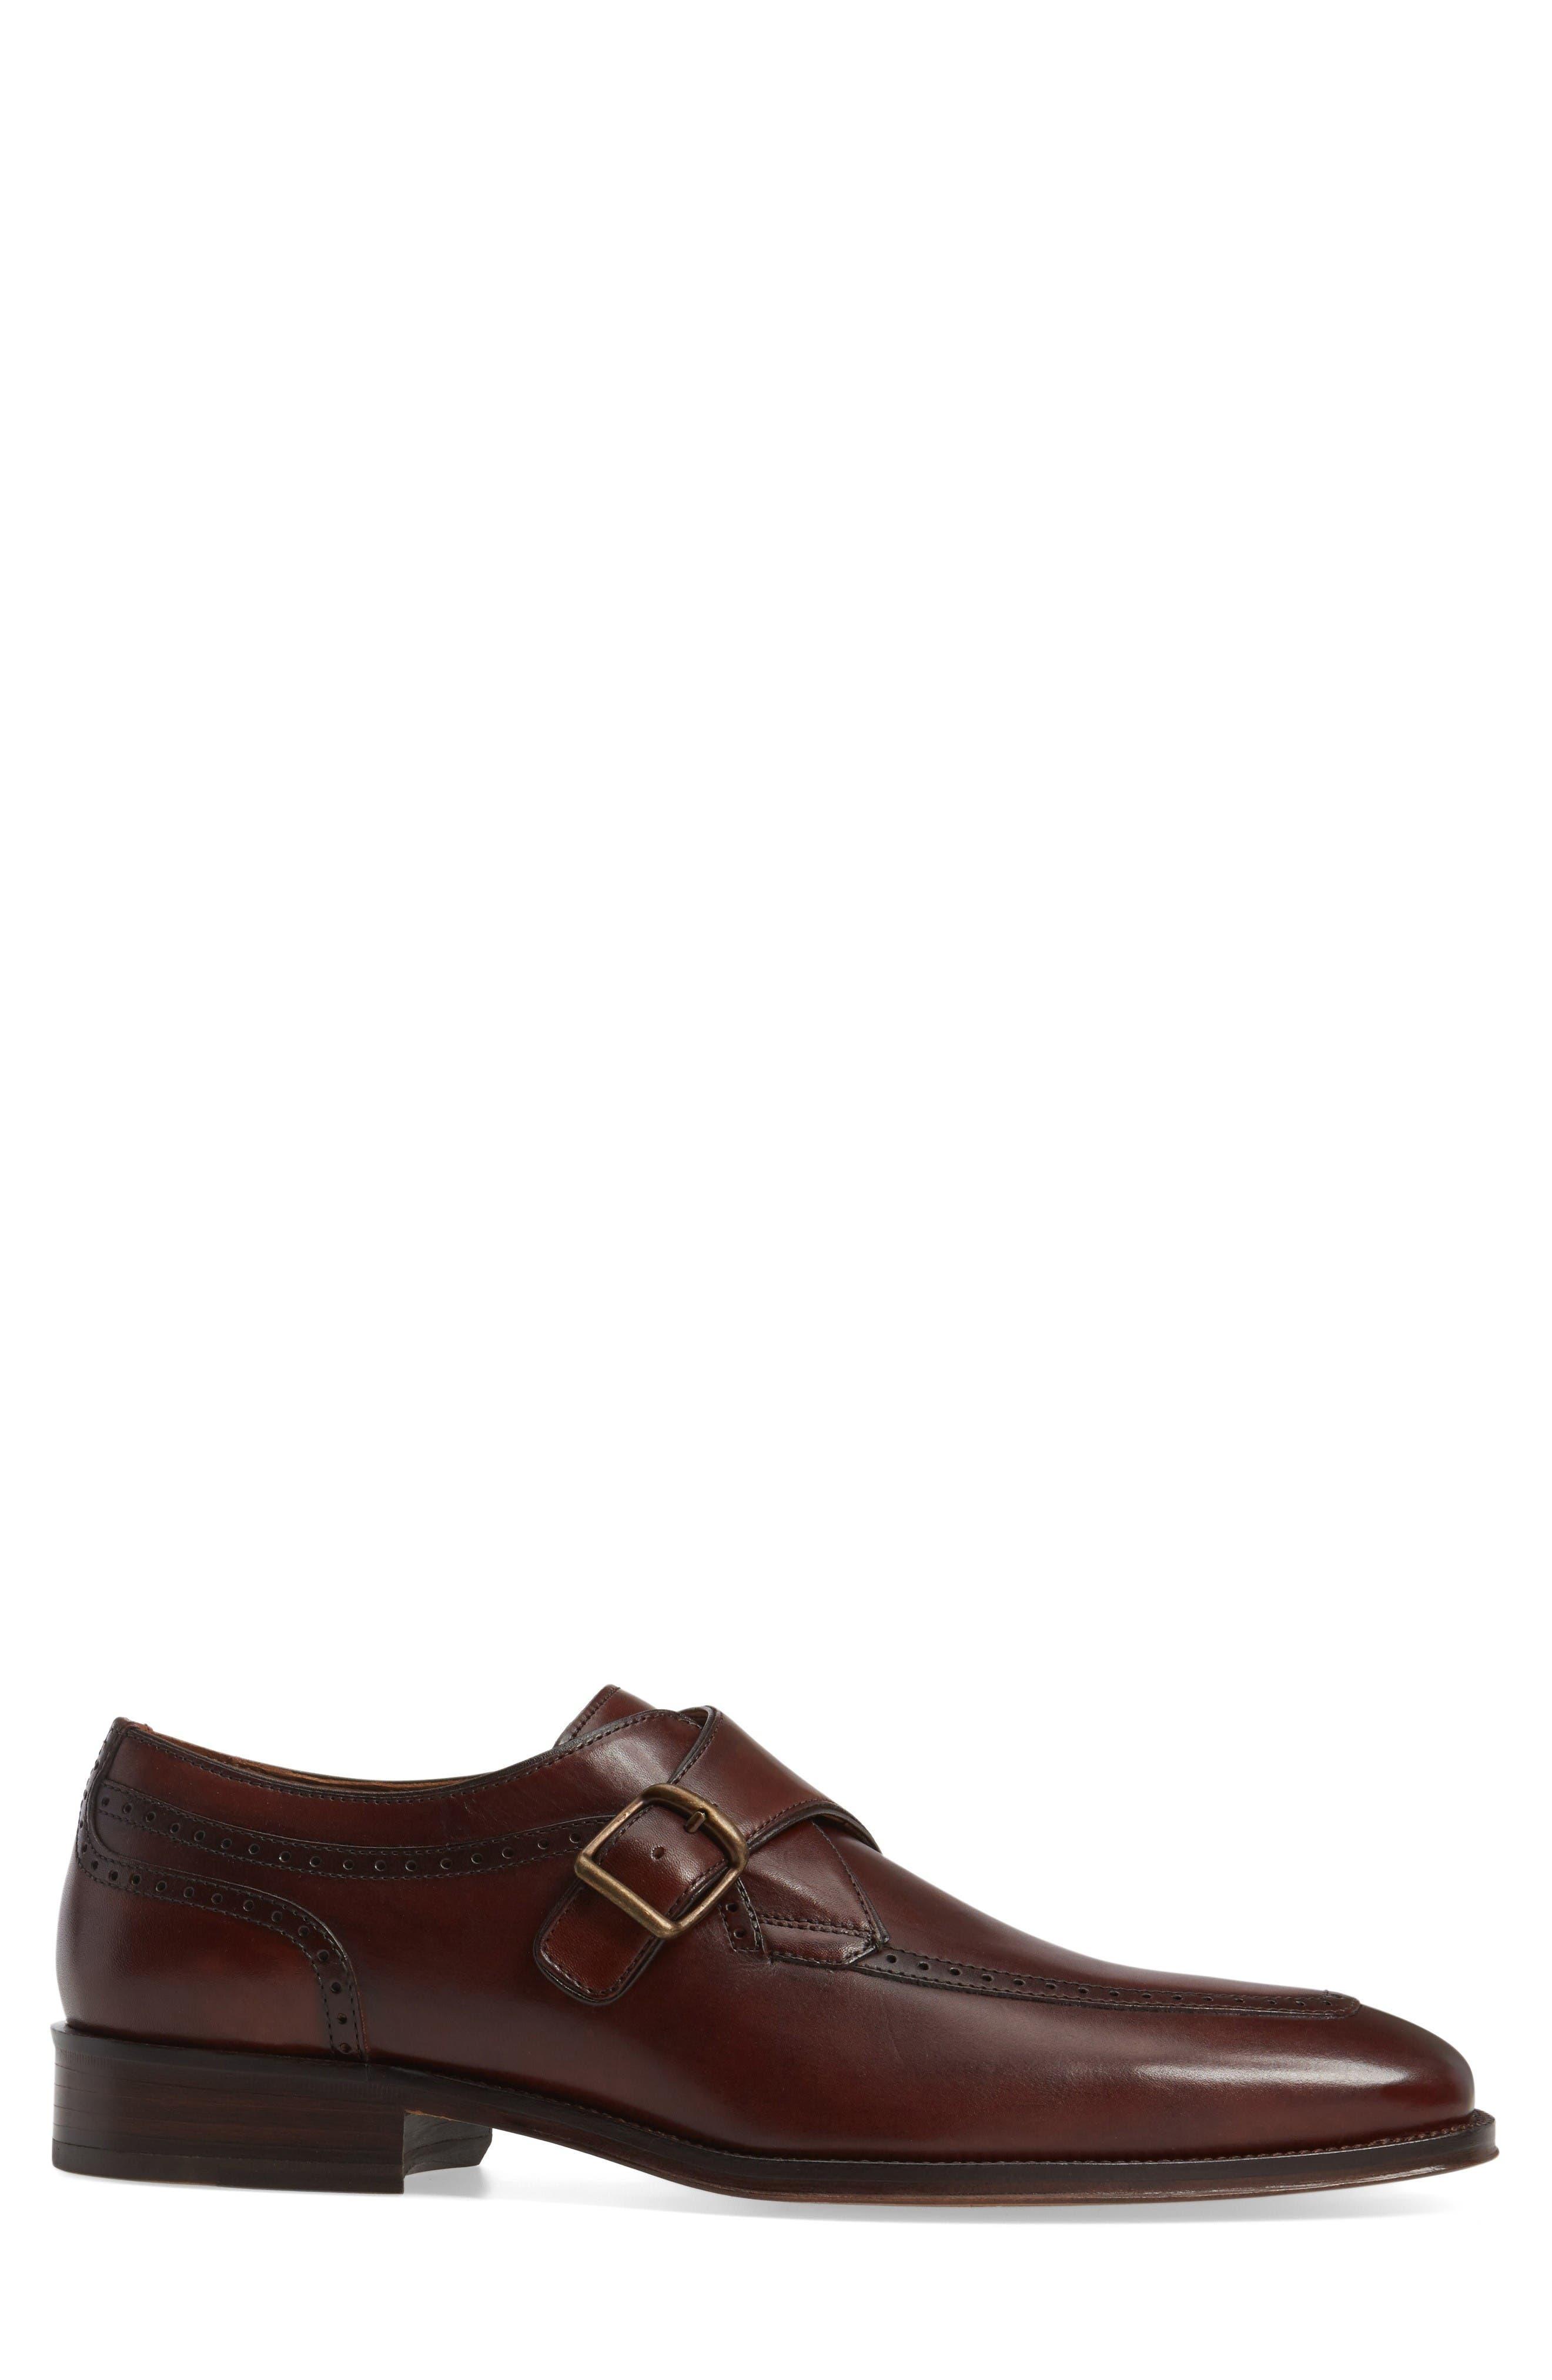 Alternate Image 3  - Johnston & Murphy Boydstun Monk Strap Shoe (Men)